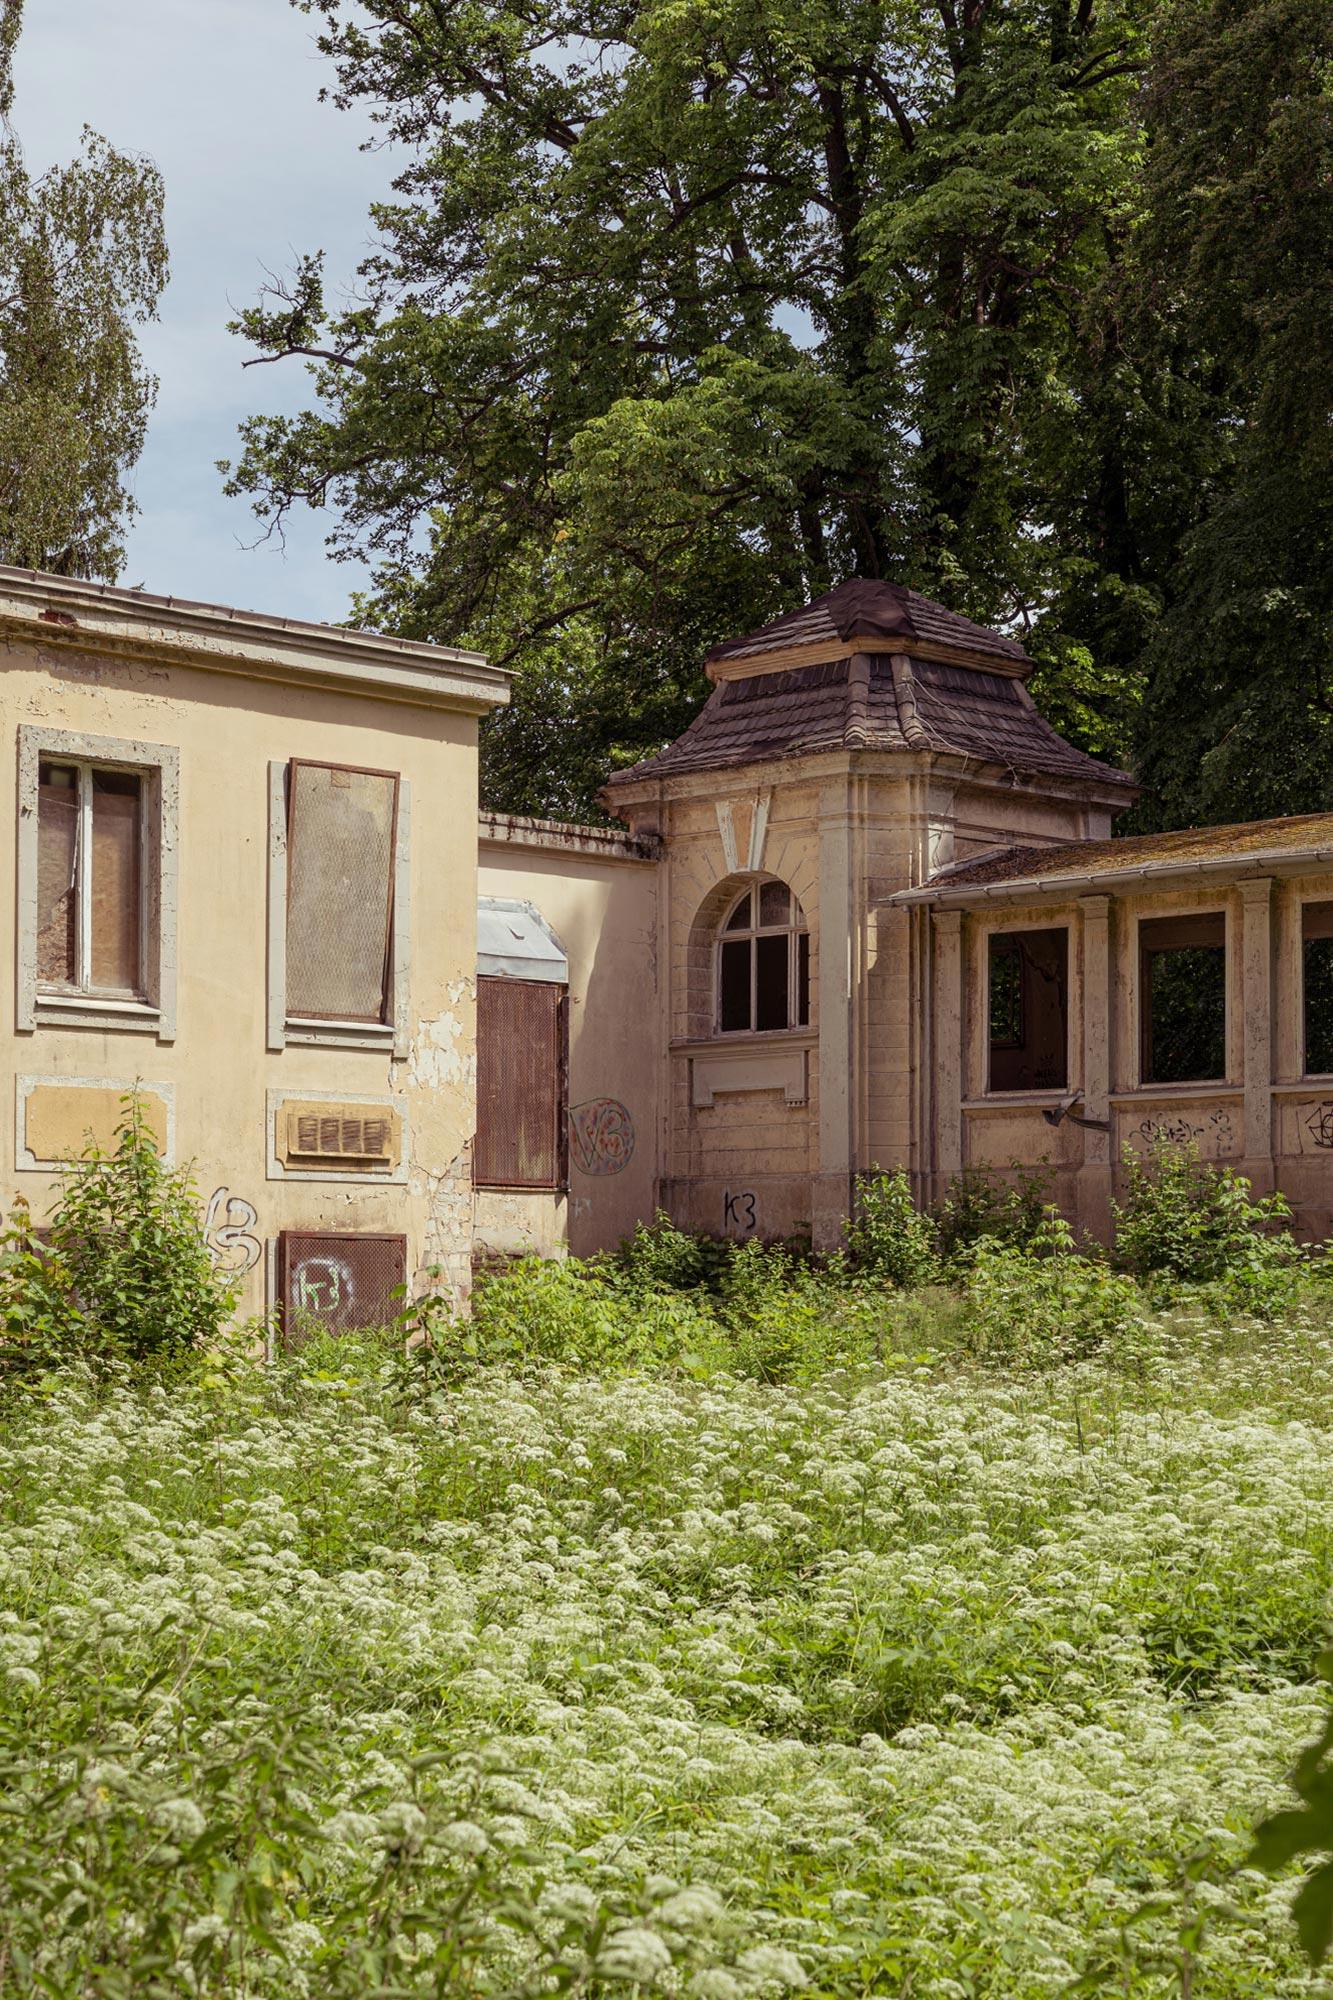 Foraging at Dhamsmuhlen Schloss